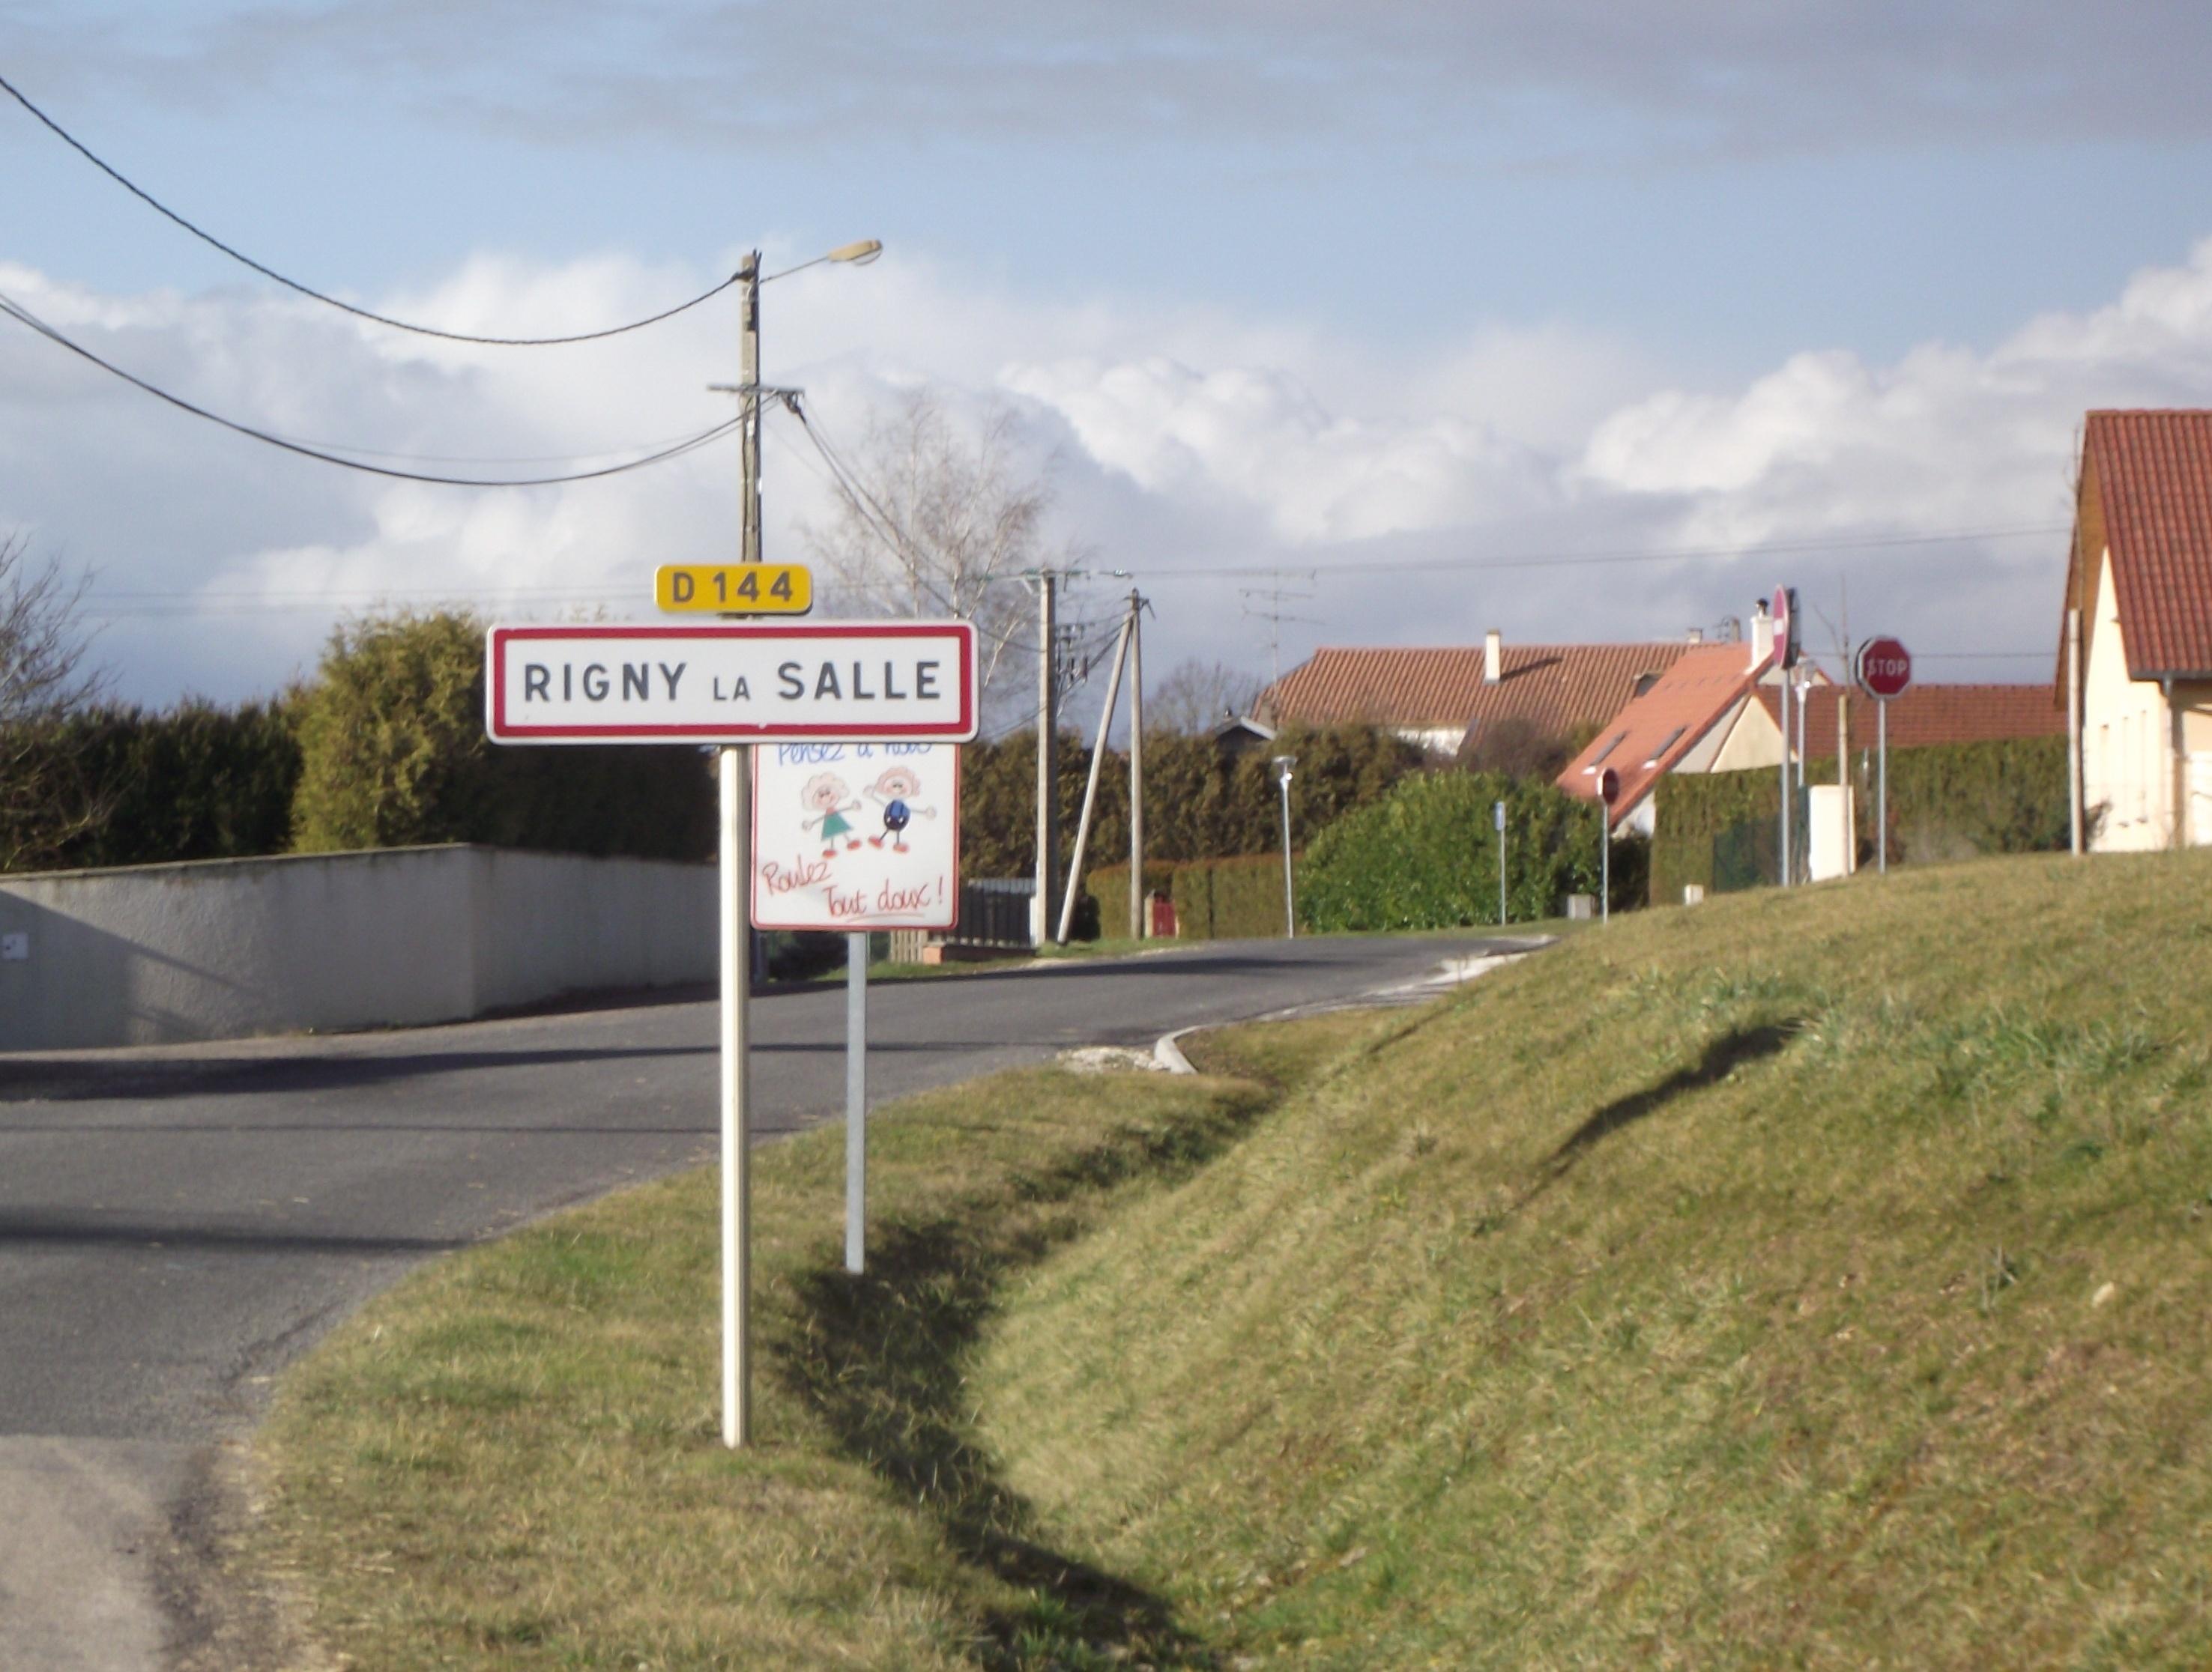 Rigny-la-Salle